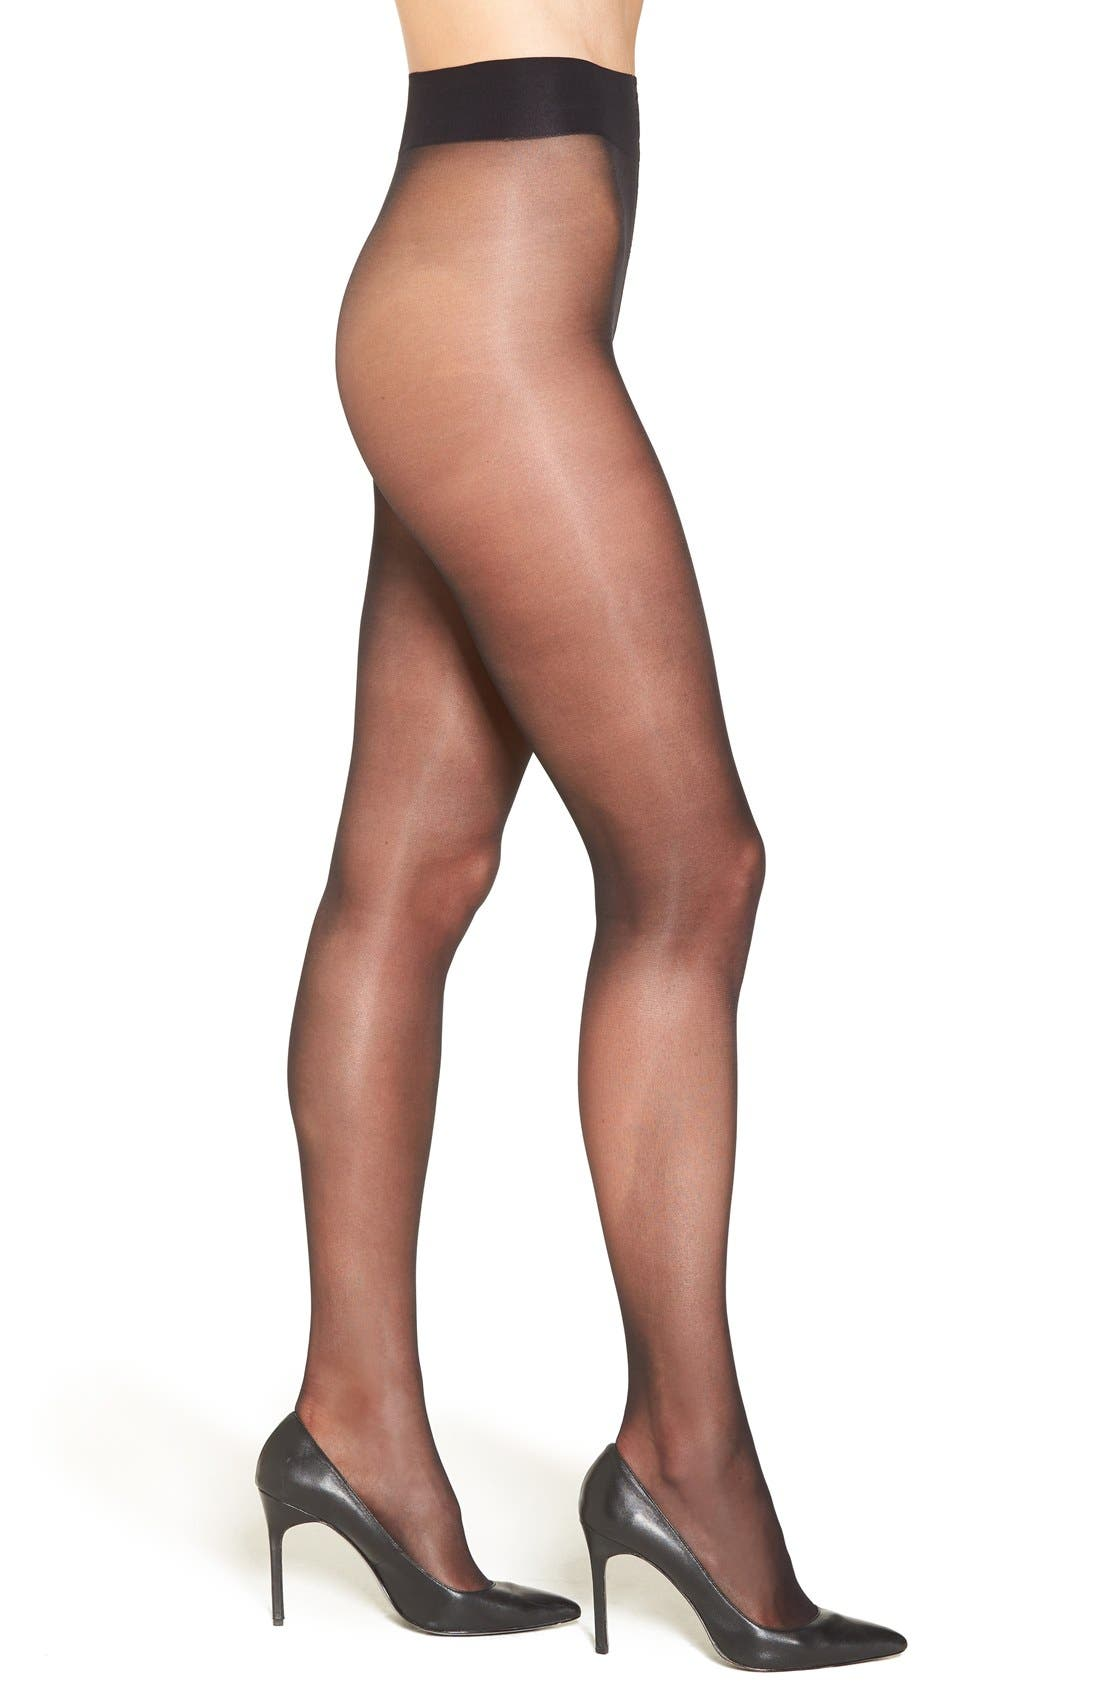 Alternate Image 1 Selected - Nordstrom Low Rise Sheer Pantyhose